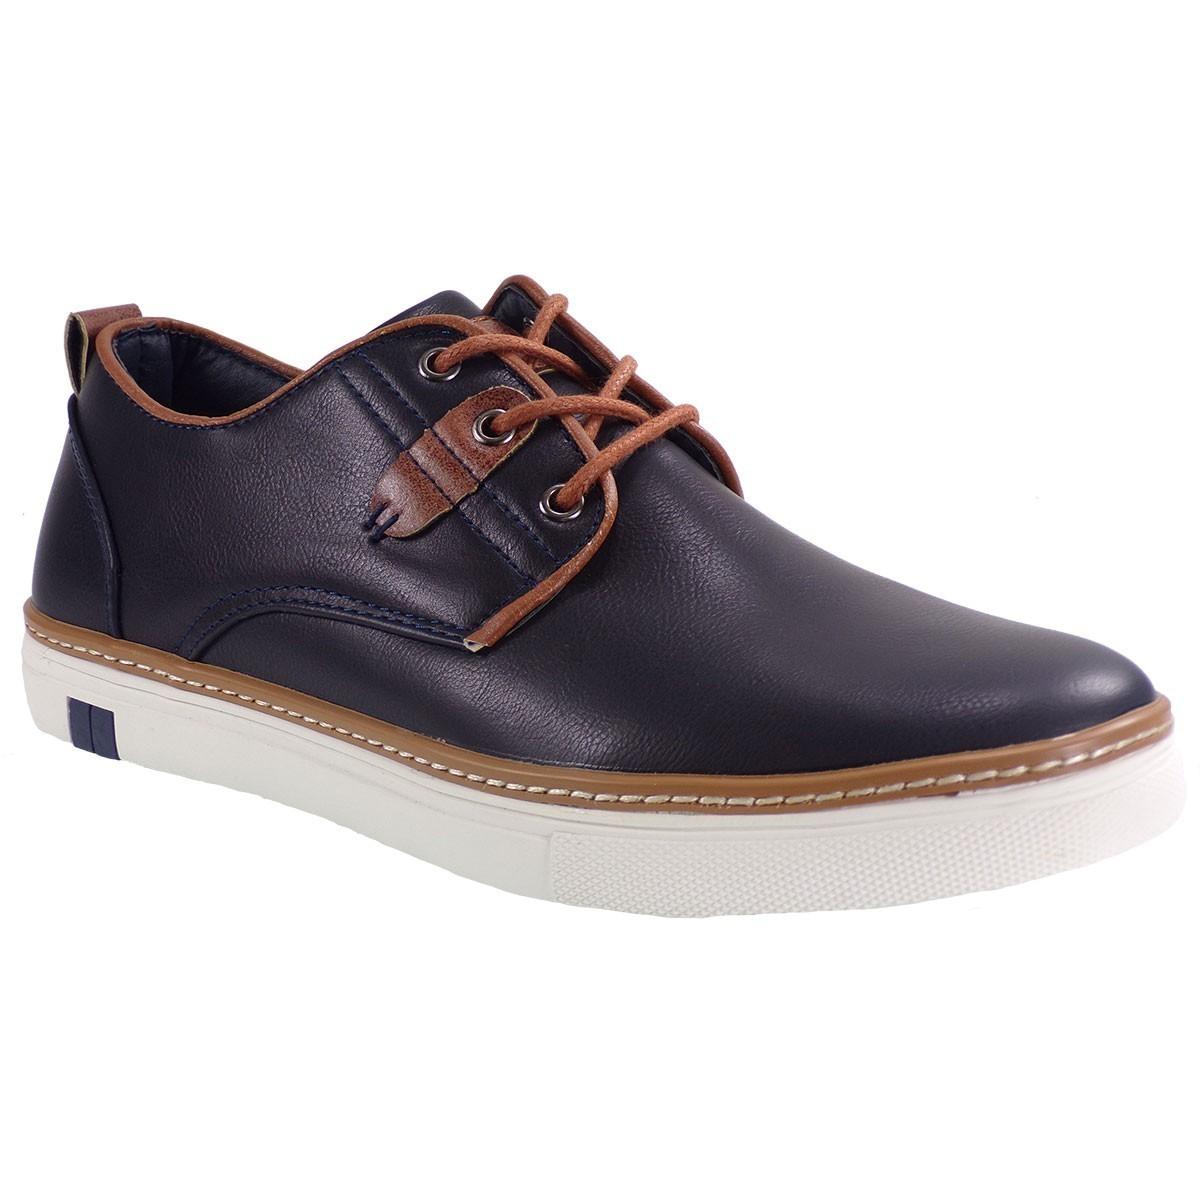 calgary andika papoytsia sneakers a1001 mple tampa www.bagiotashoes.gr (4)